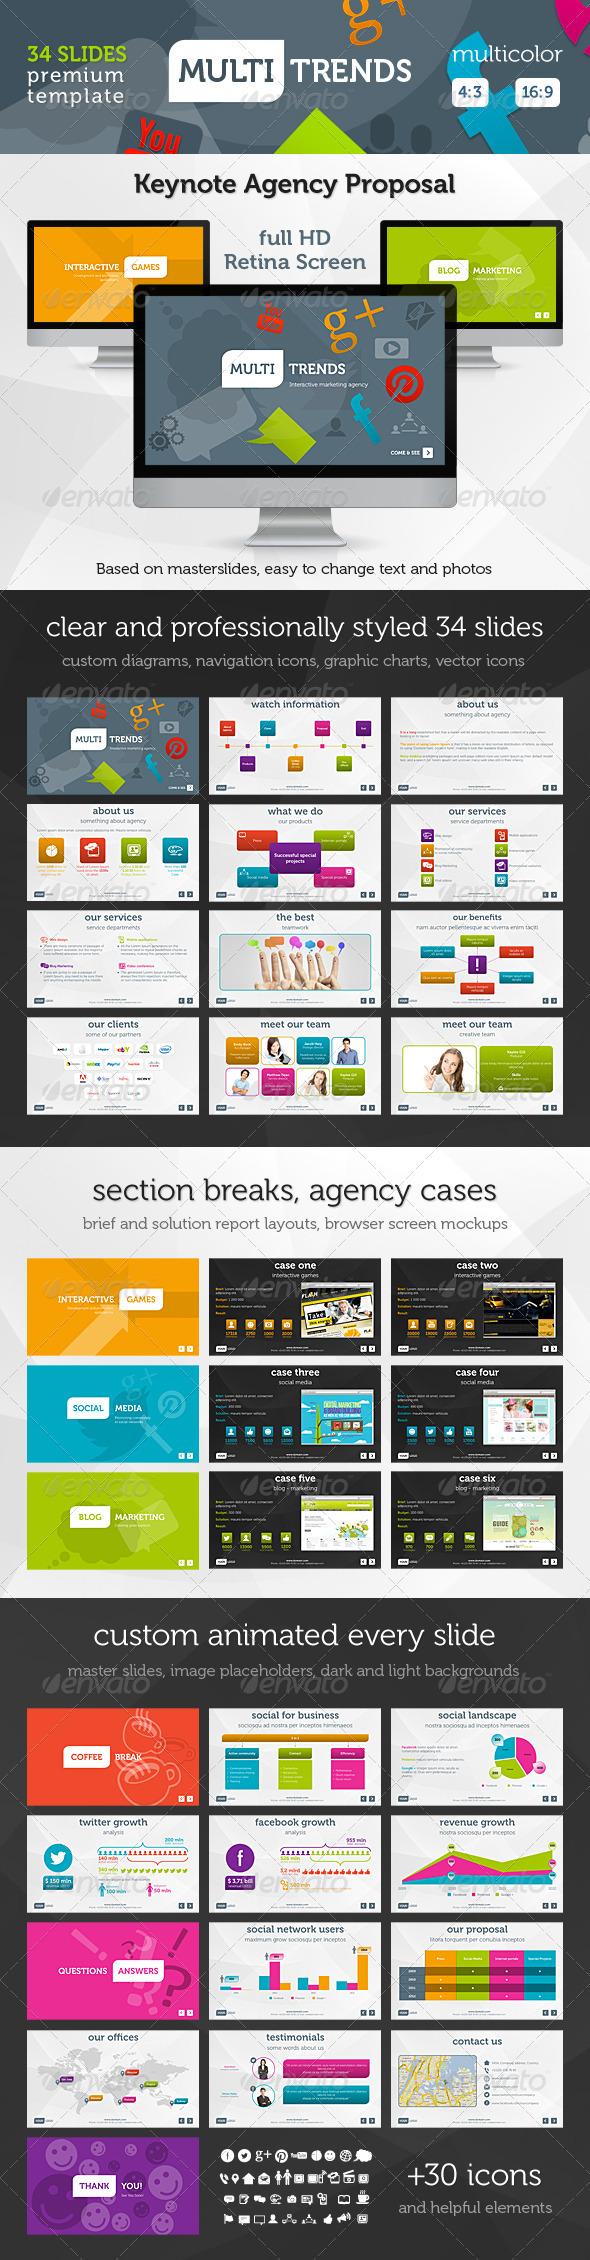 Multi Trends Keynote Presentation Template - Keynote Templates Presentation Templates